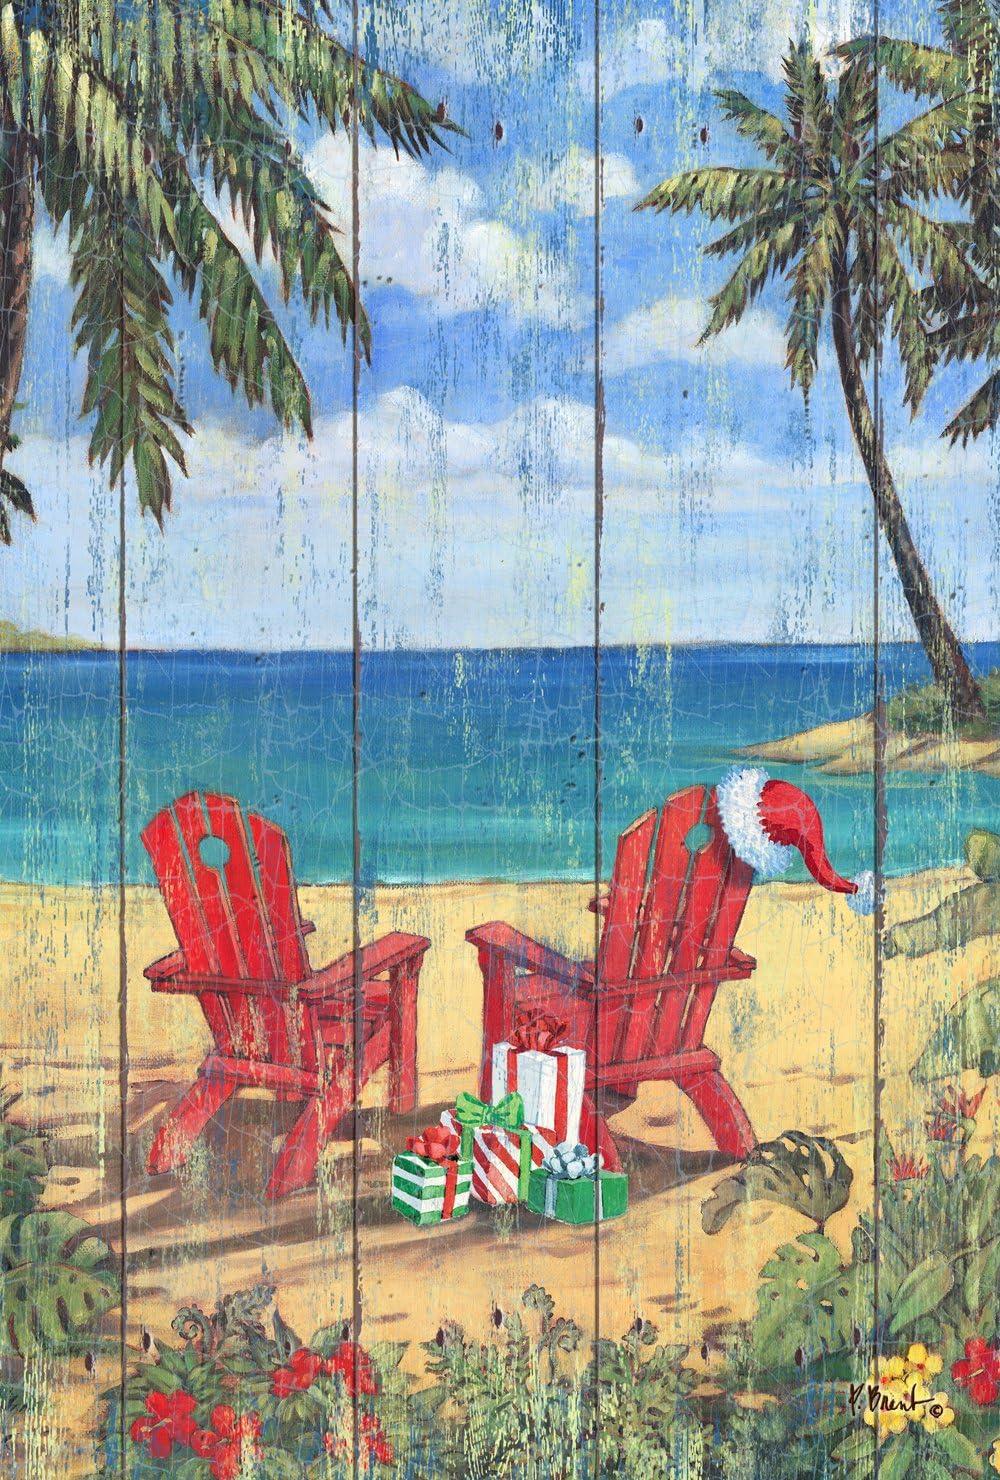 Toland Home Garden Christmas Paradise 28 x 40 Inch Decorative Beach Adirondack Tropical Island Vacation House Flag - 1010812